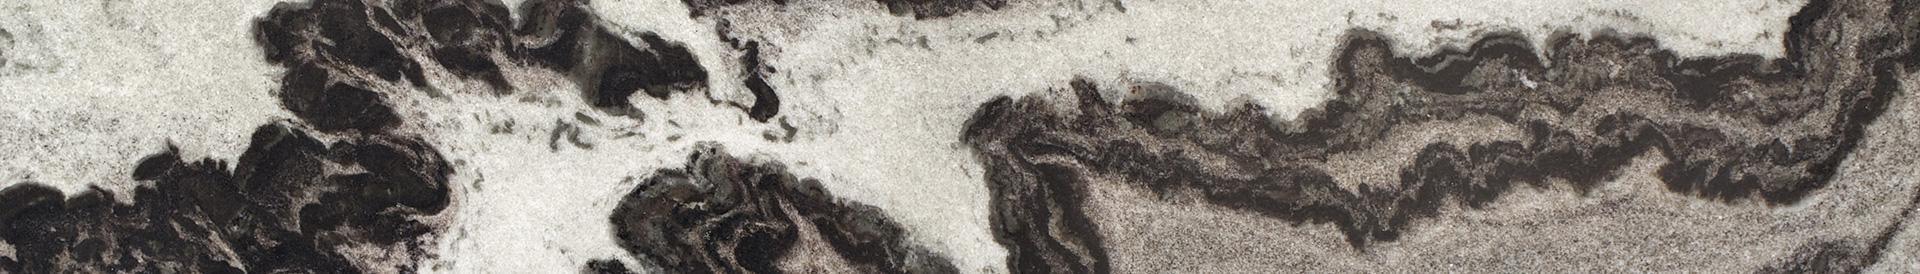 wzór na marmurze